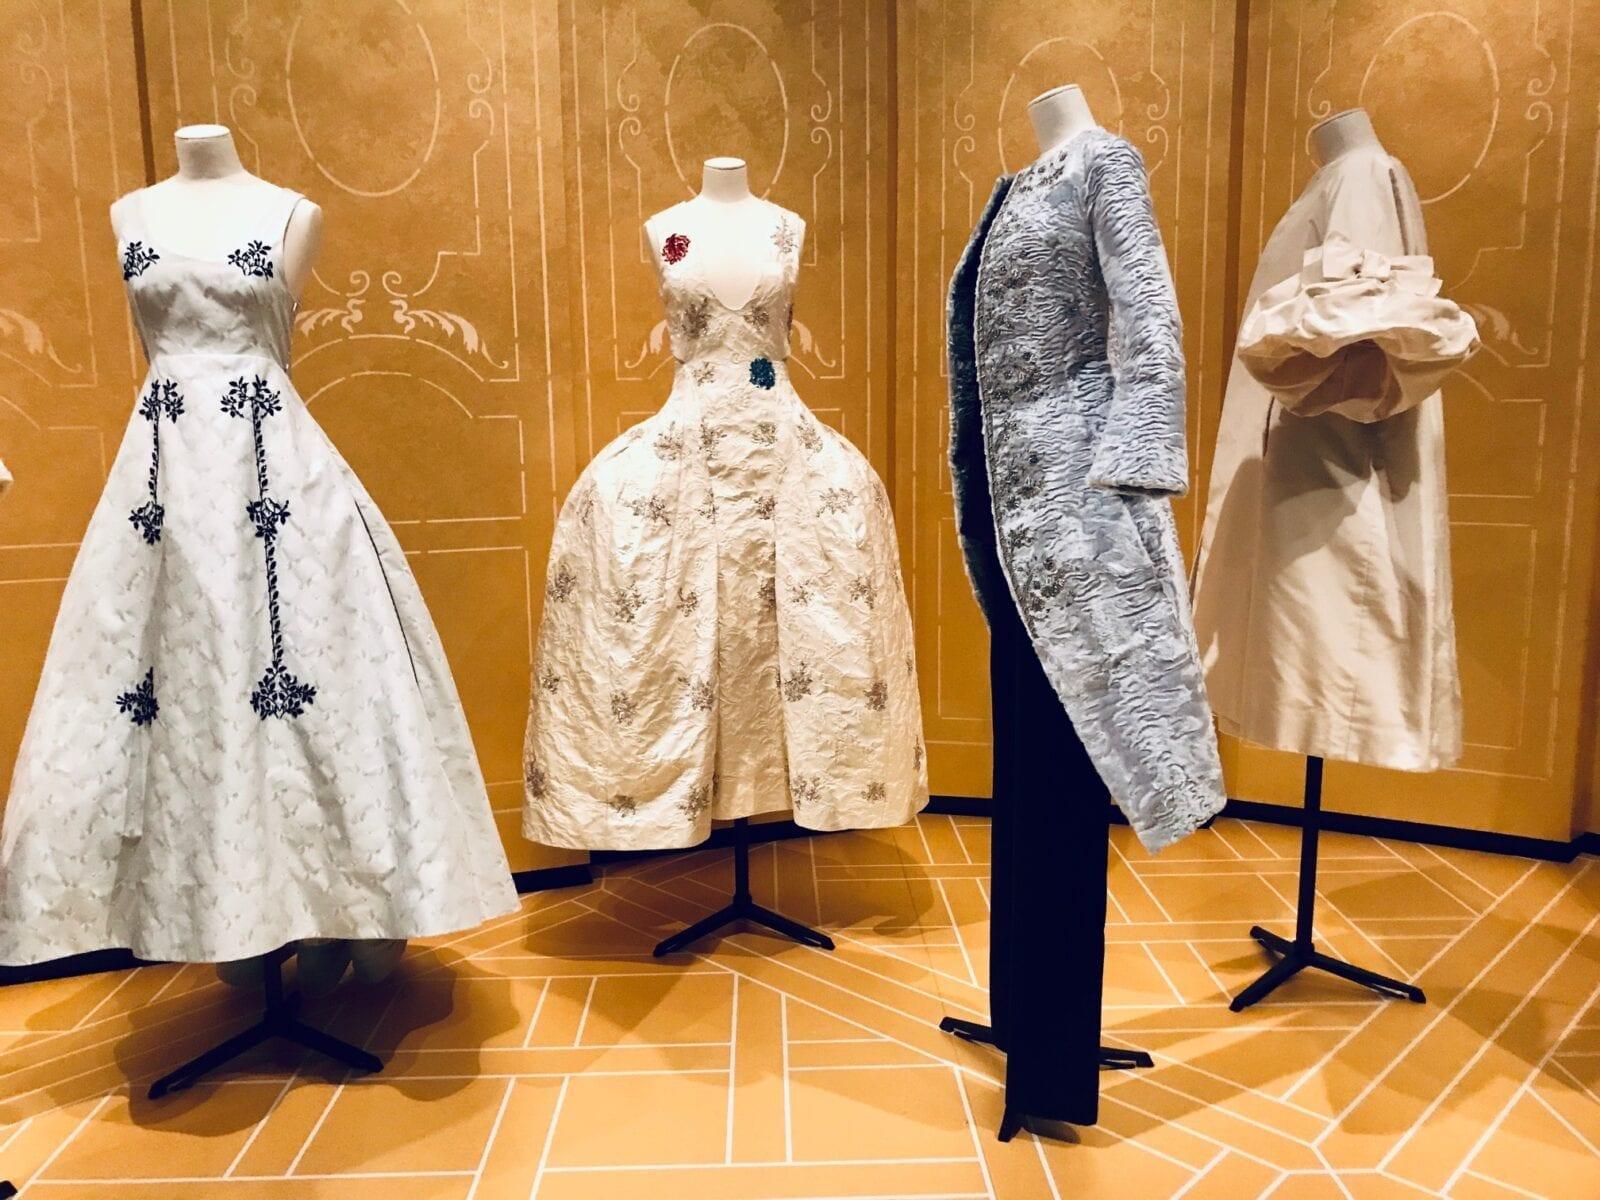 image of Christian Dior Exhibit at Denver Art Museum